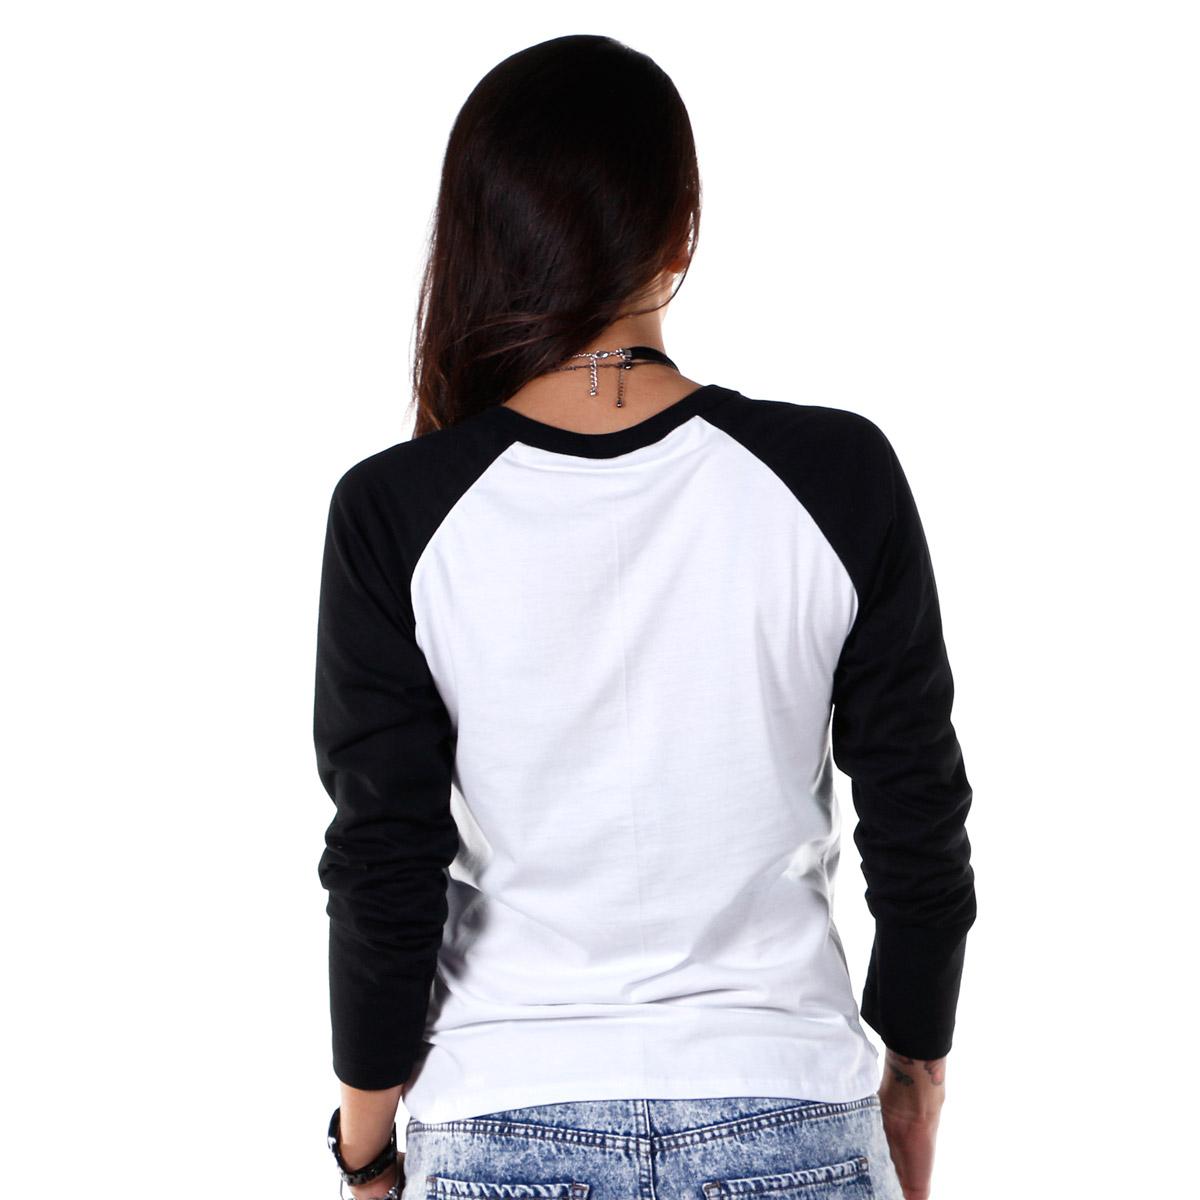 Camiseta Manga Longa Raglan Feminina Luan Santana Ac�stico